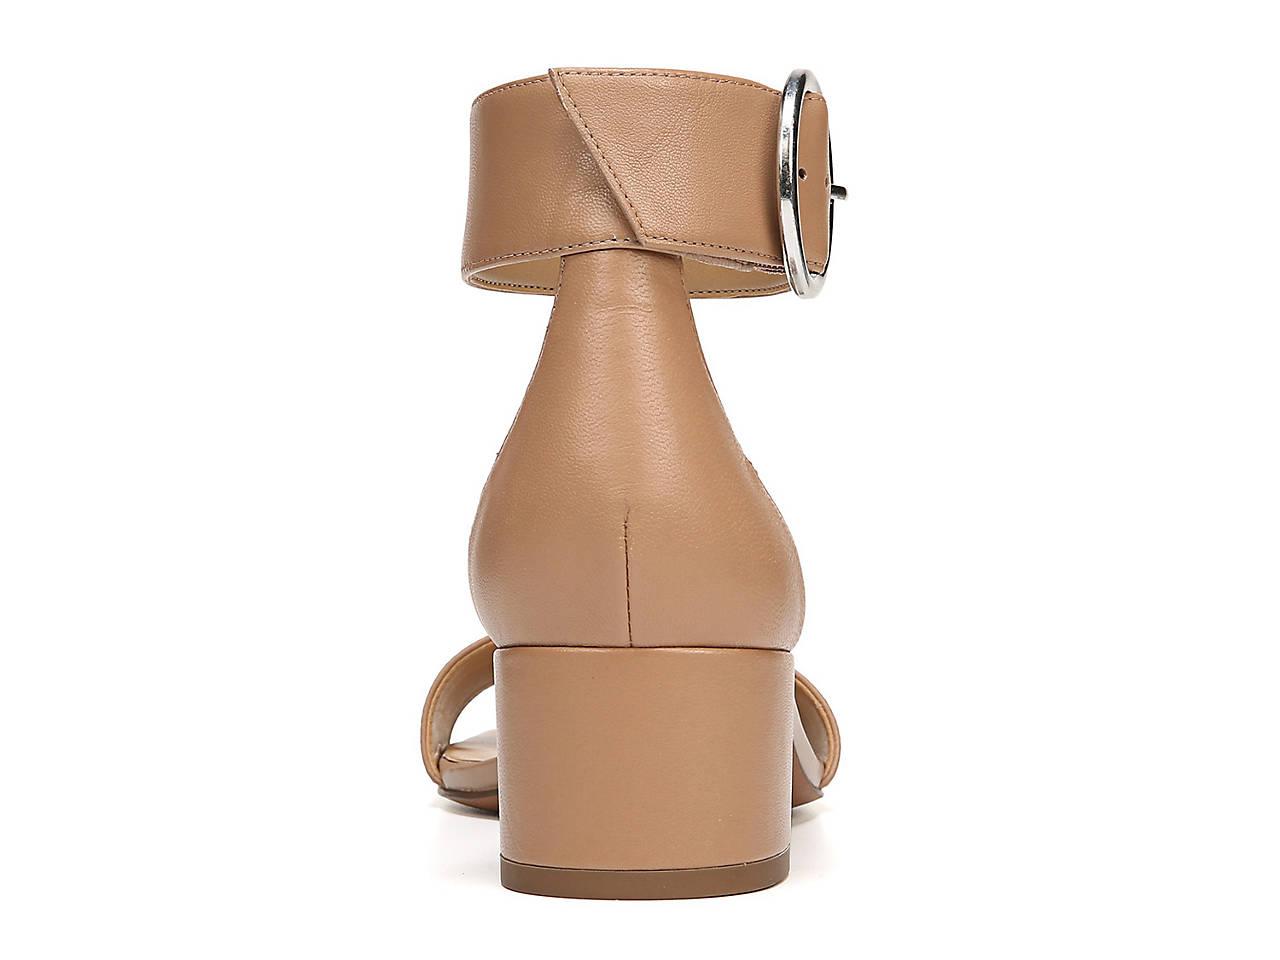 5b49bfe9aba3 Franco Sarto Ronnie Sandal Women s Shoes